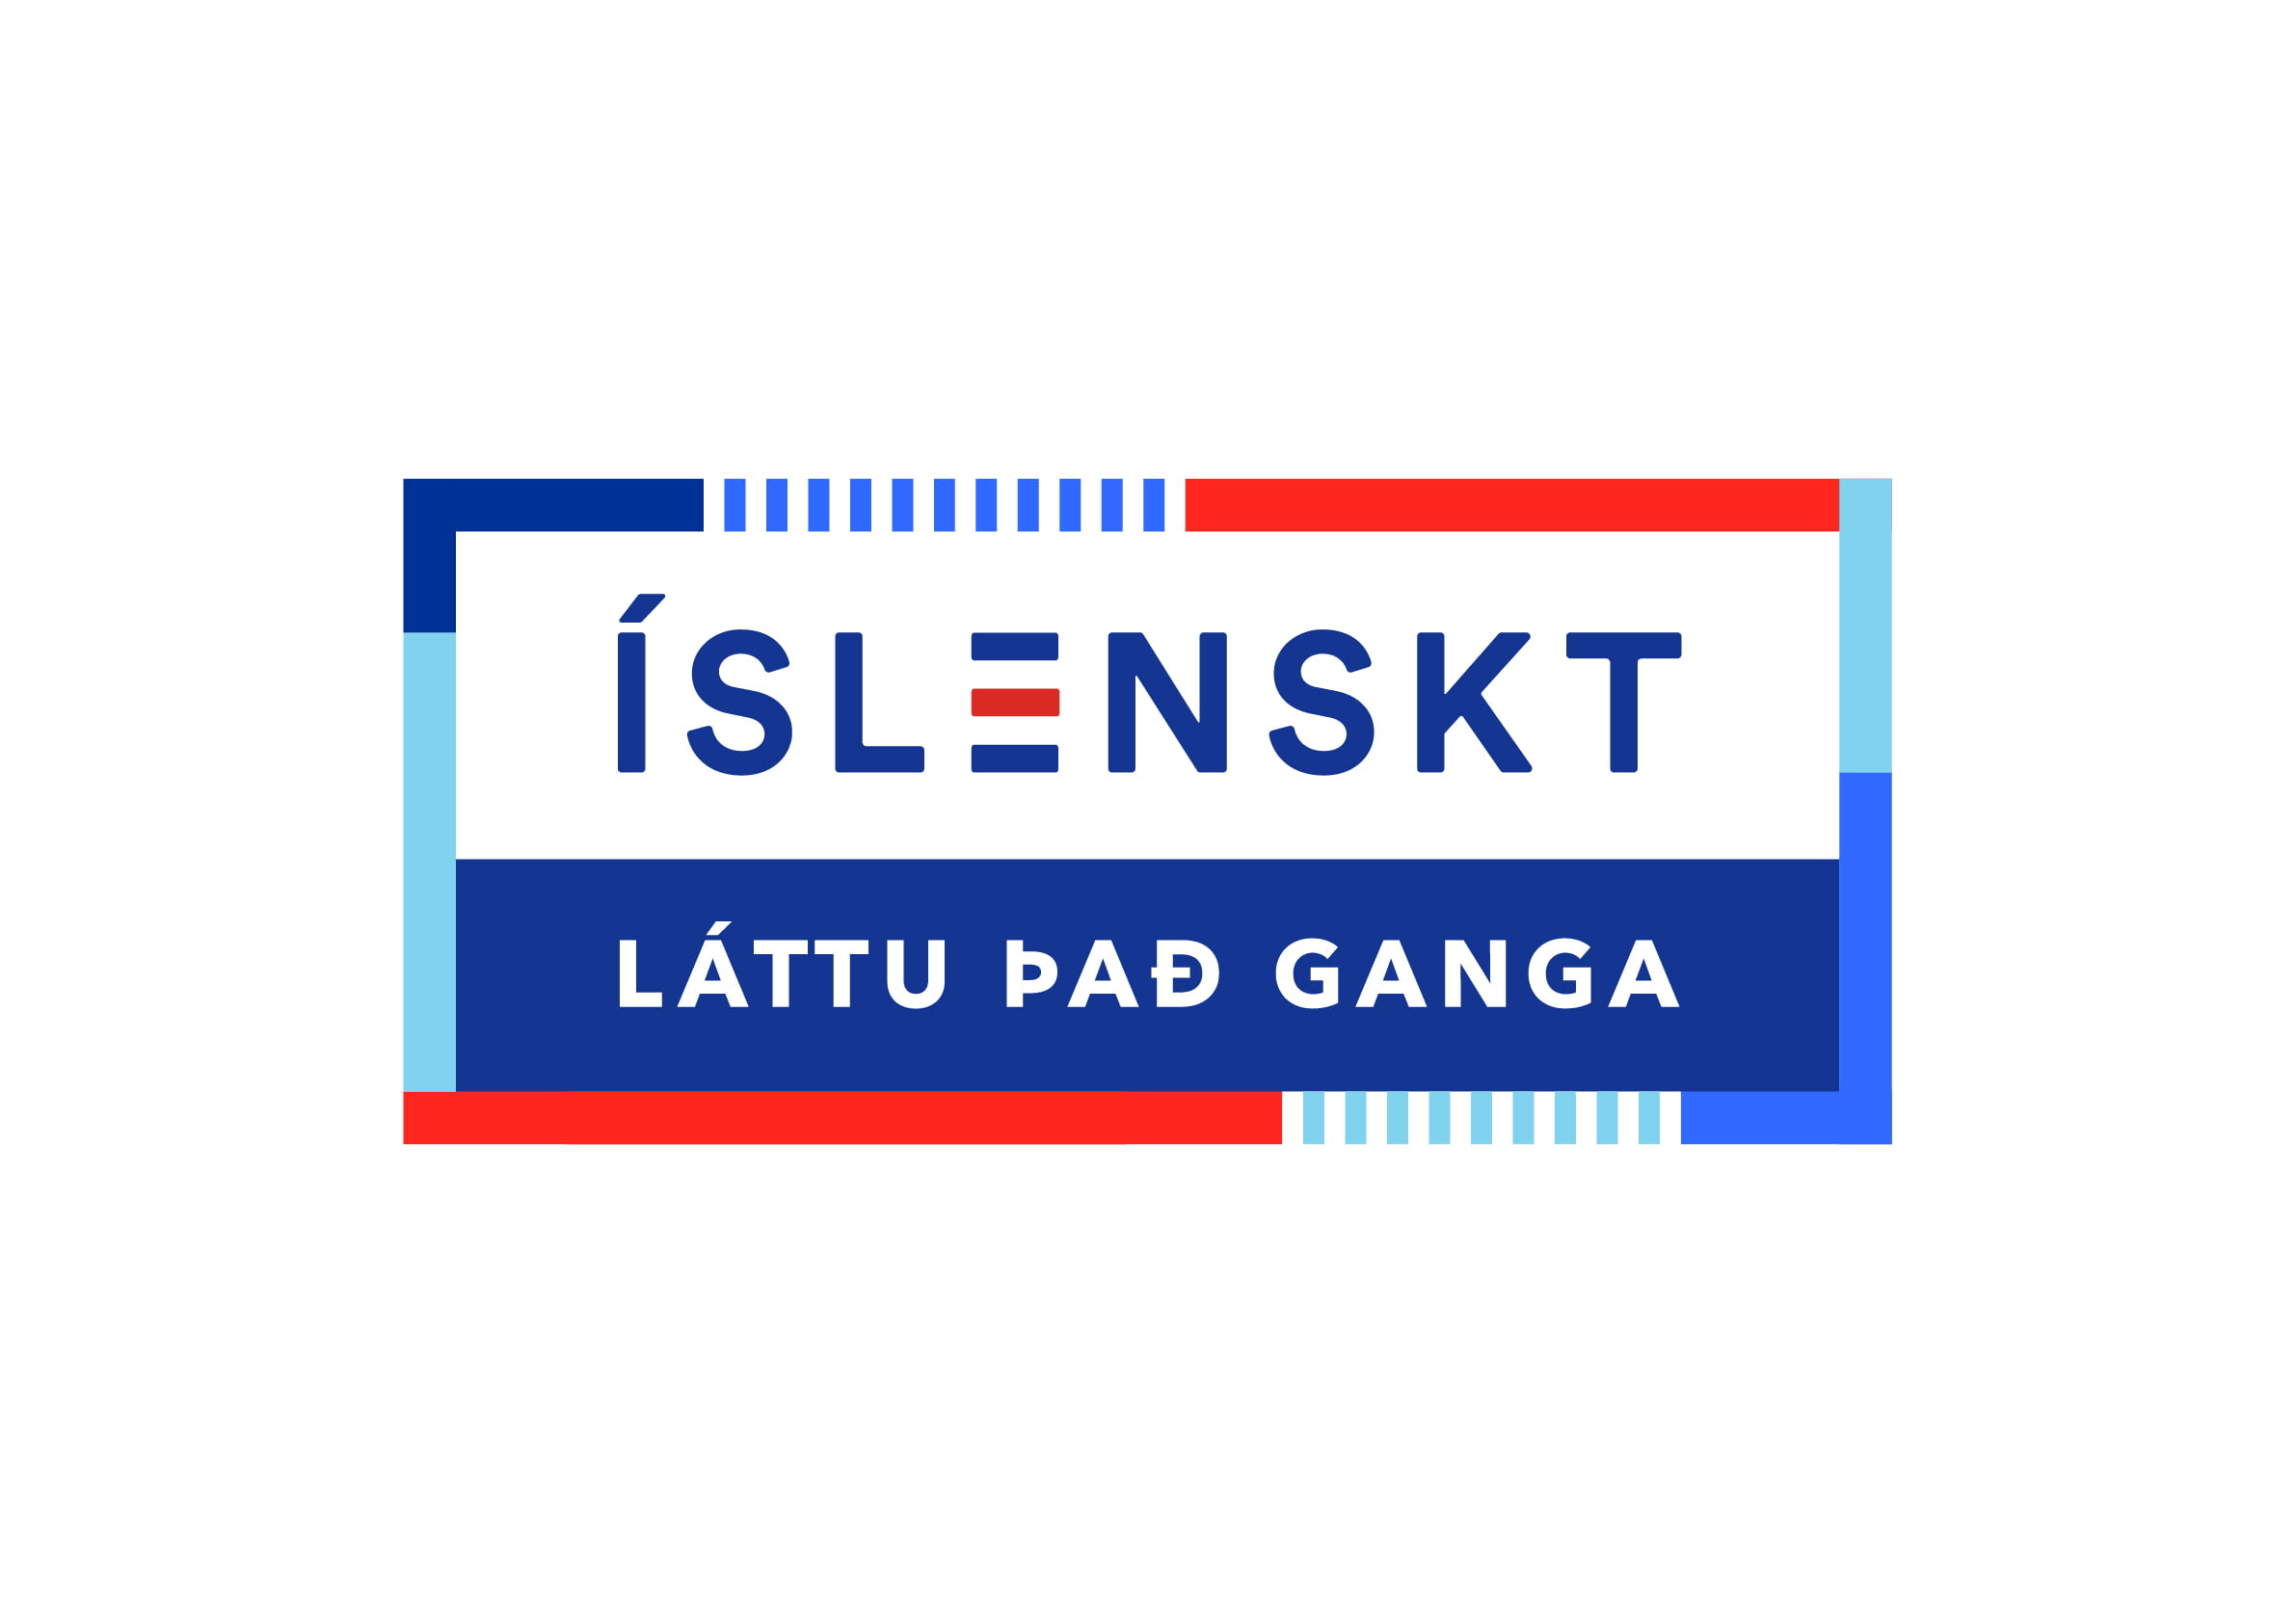 Islenskt_latum_thad_ganga_2